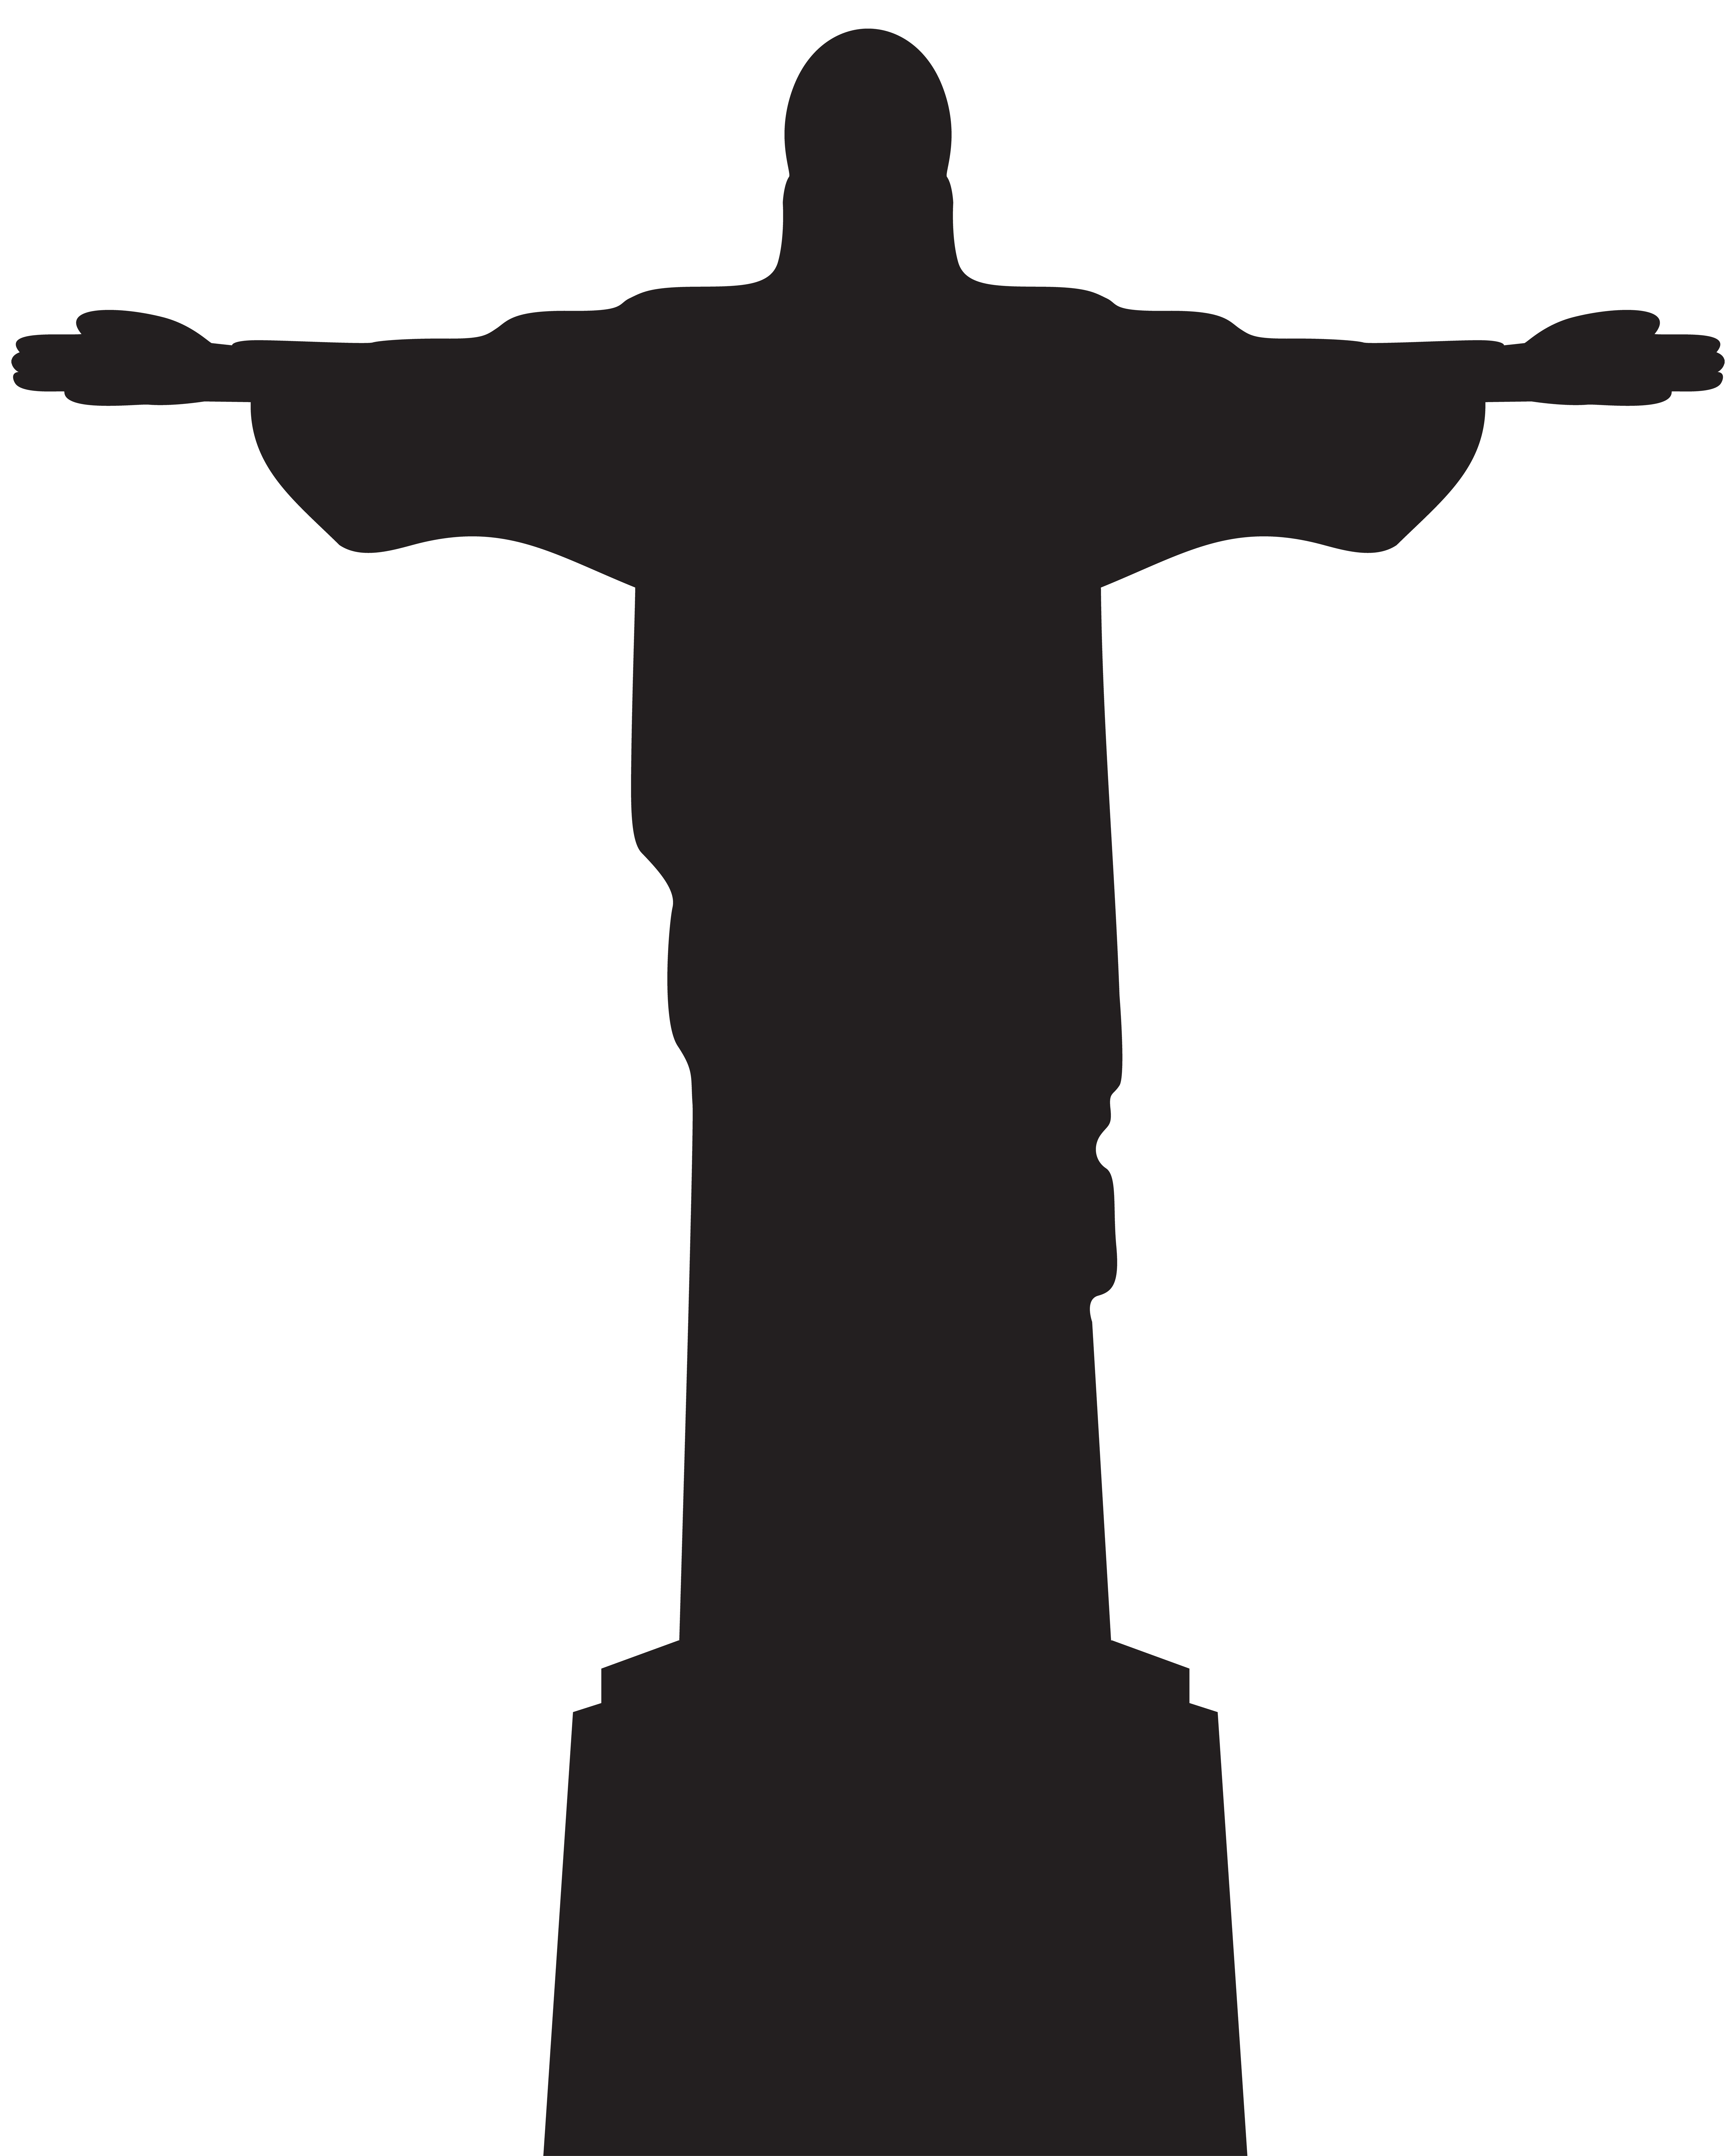 6443x8000 Jesus Christ Statue Silhouette Png Clip Artu200b Gallery